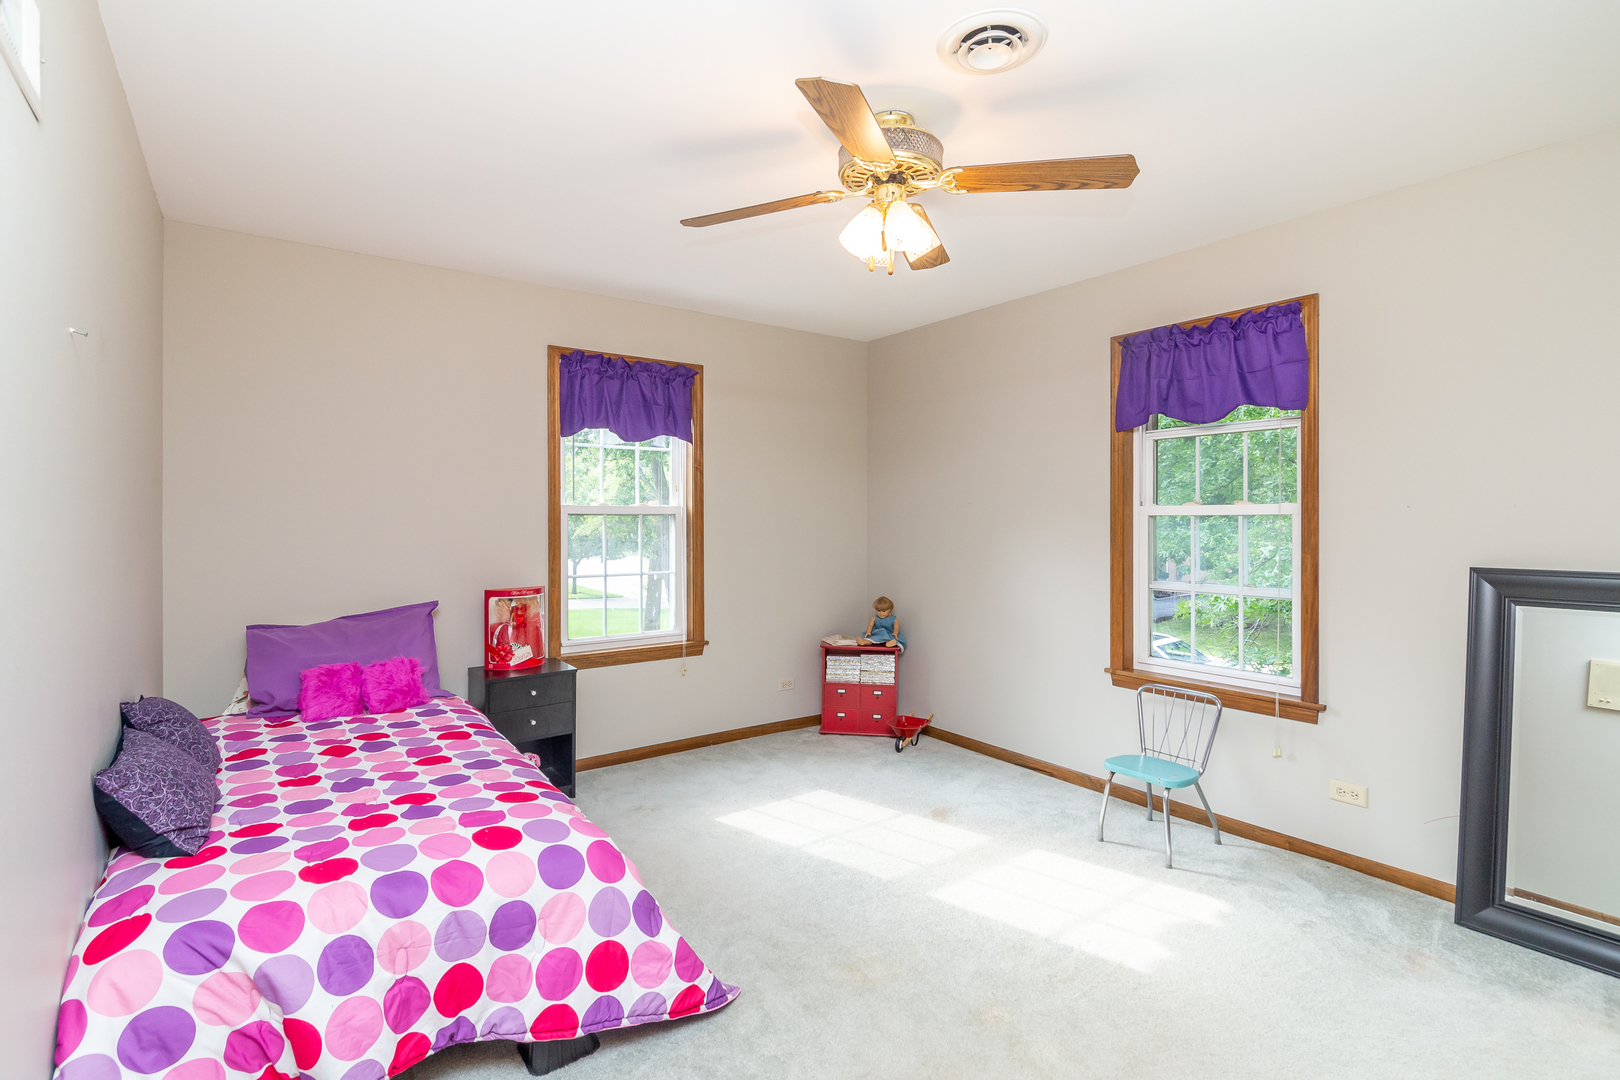 2245 Covert, Glenview, Illinois, 60638